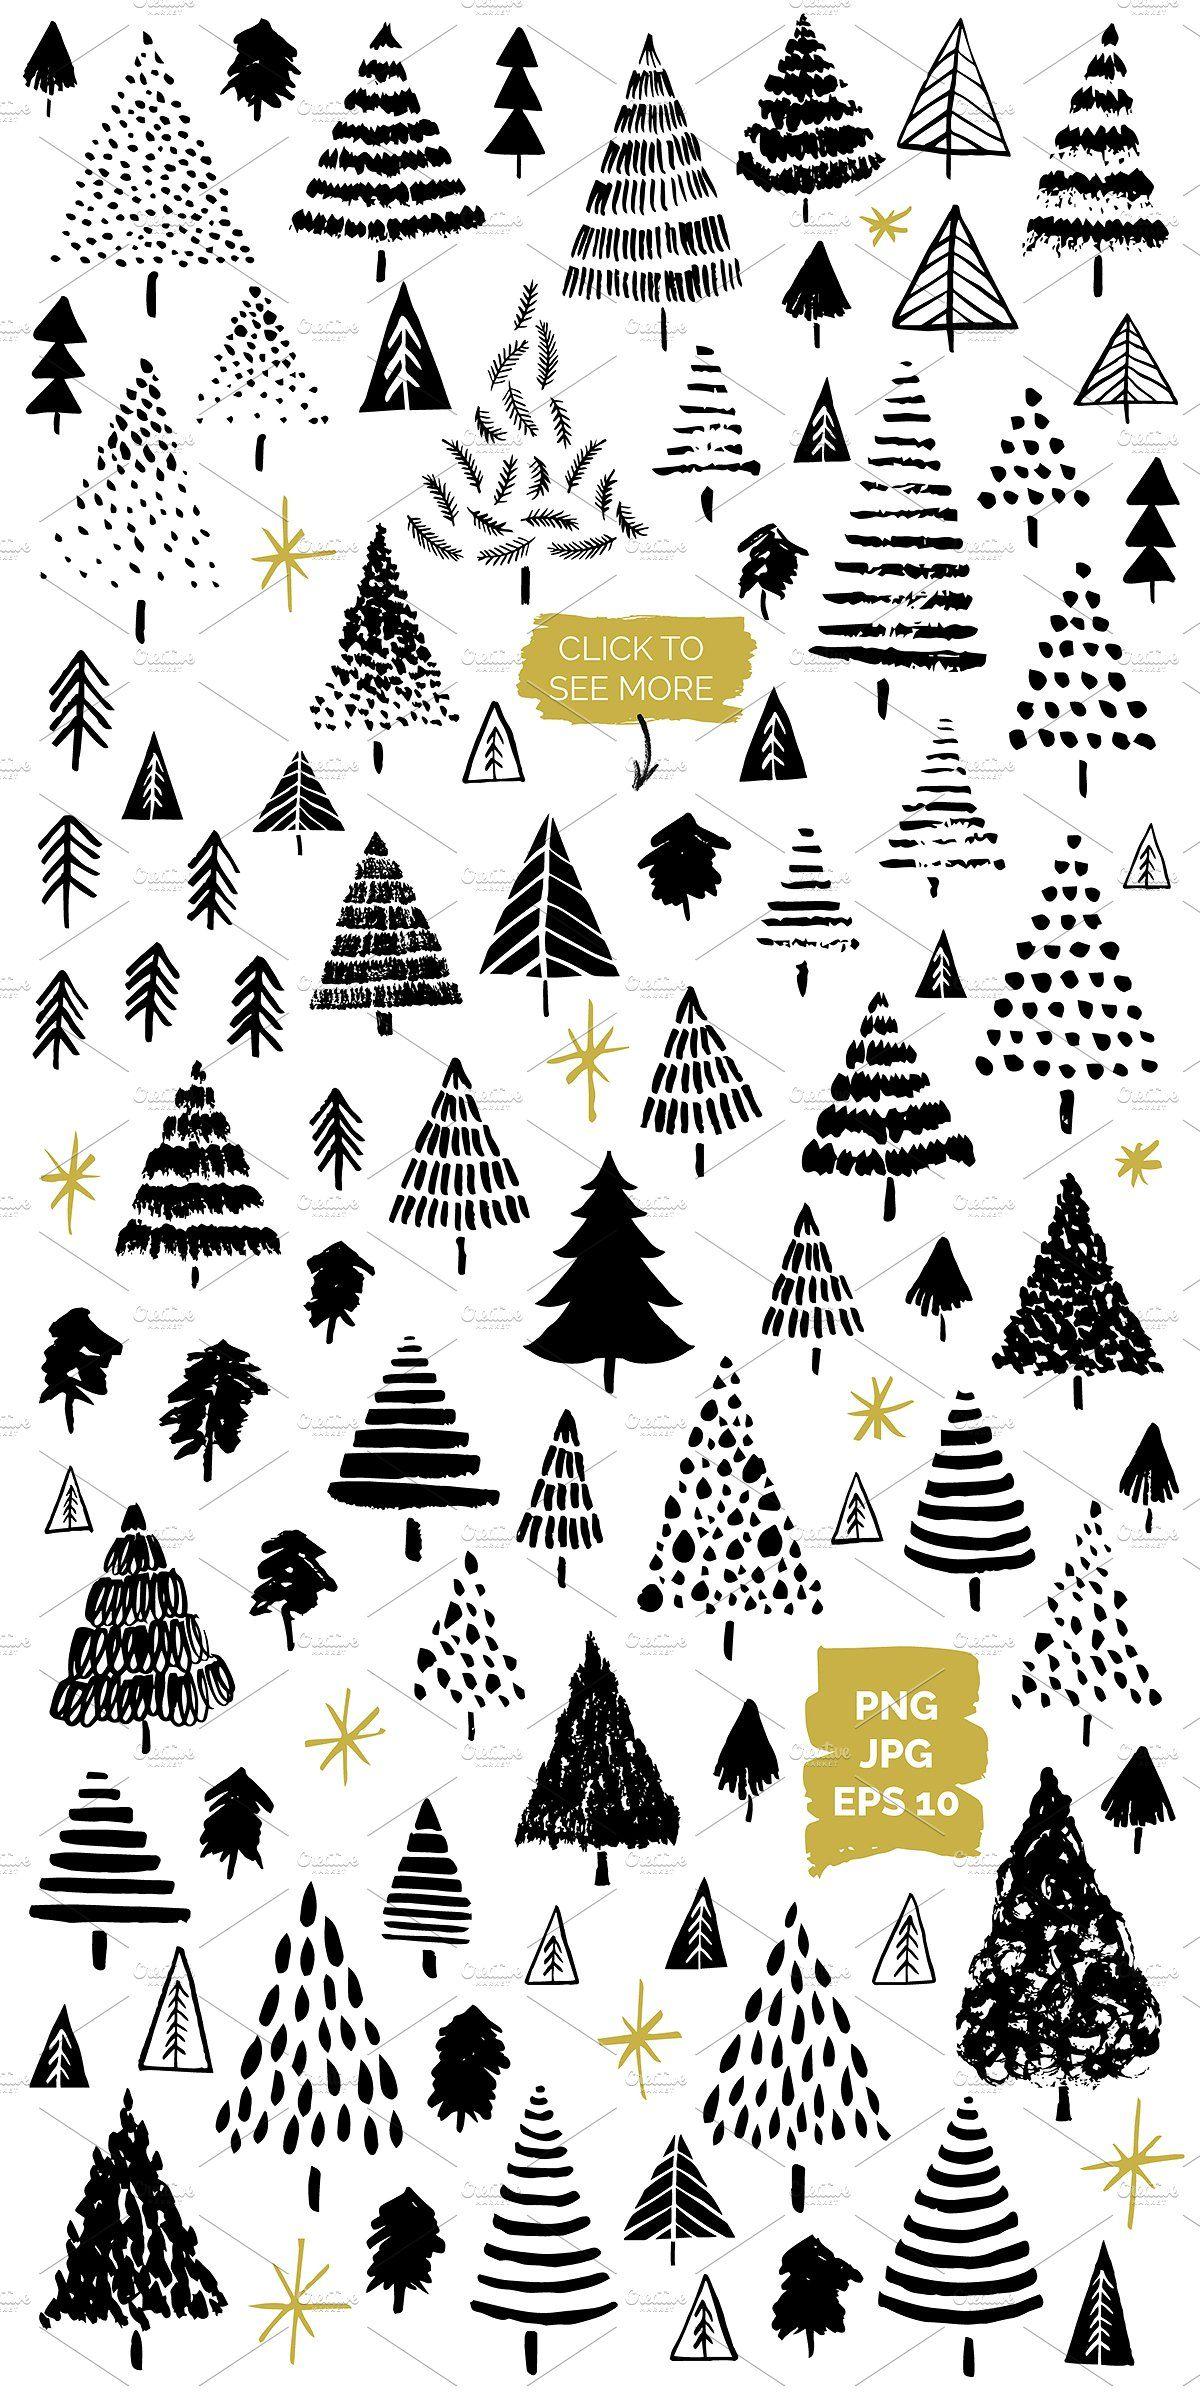 Scandi Christmas Tree Drawing.Christmas Tree Vector Graphics Hand Drawn Painted